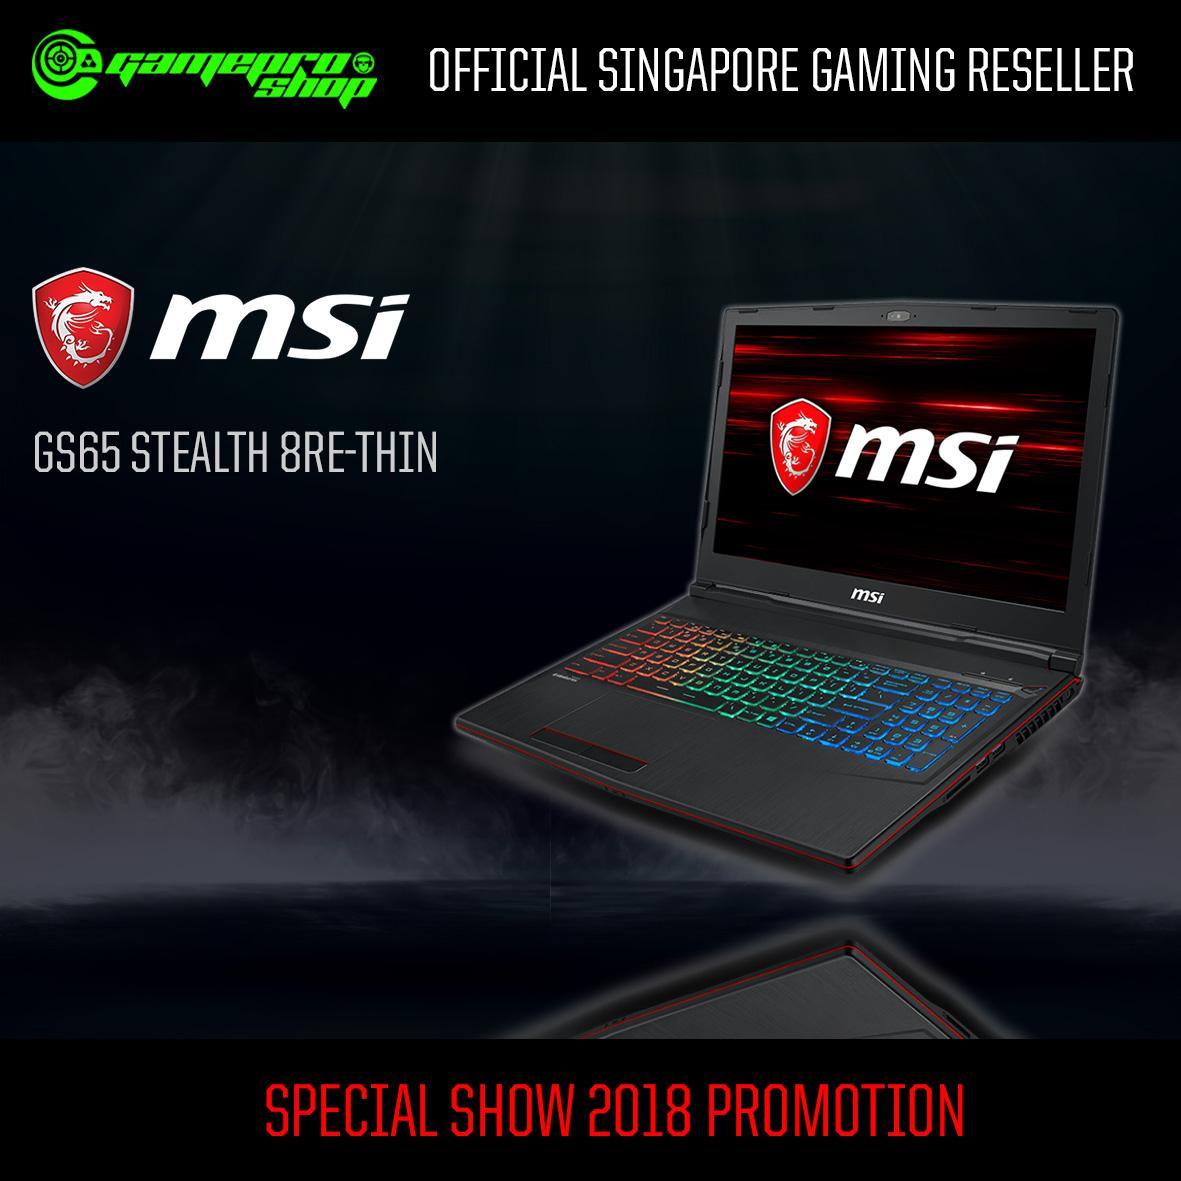 MSI GP63 Leopard 8RE-285SG (I7-8750H/8GB DDR4/128GB SSD+1TB HDD 7200RPM/6GB NVIDIA GTX1060 GDDR5/15.6FHD/W10)